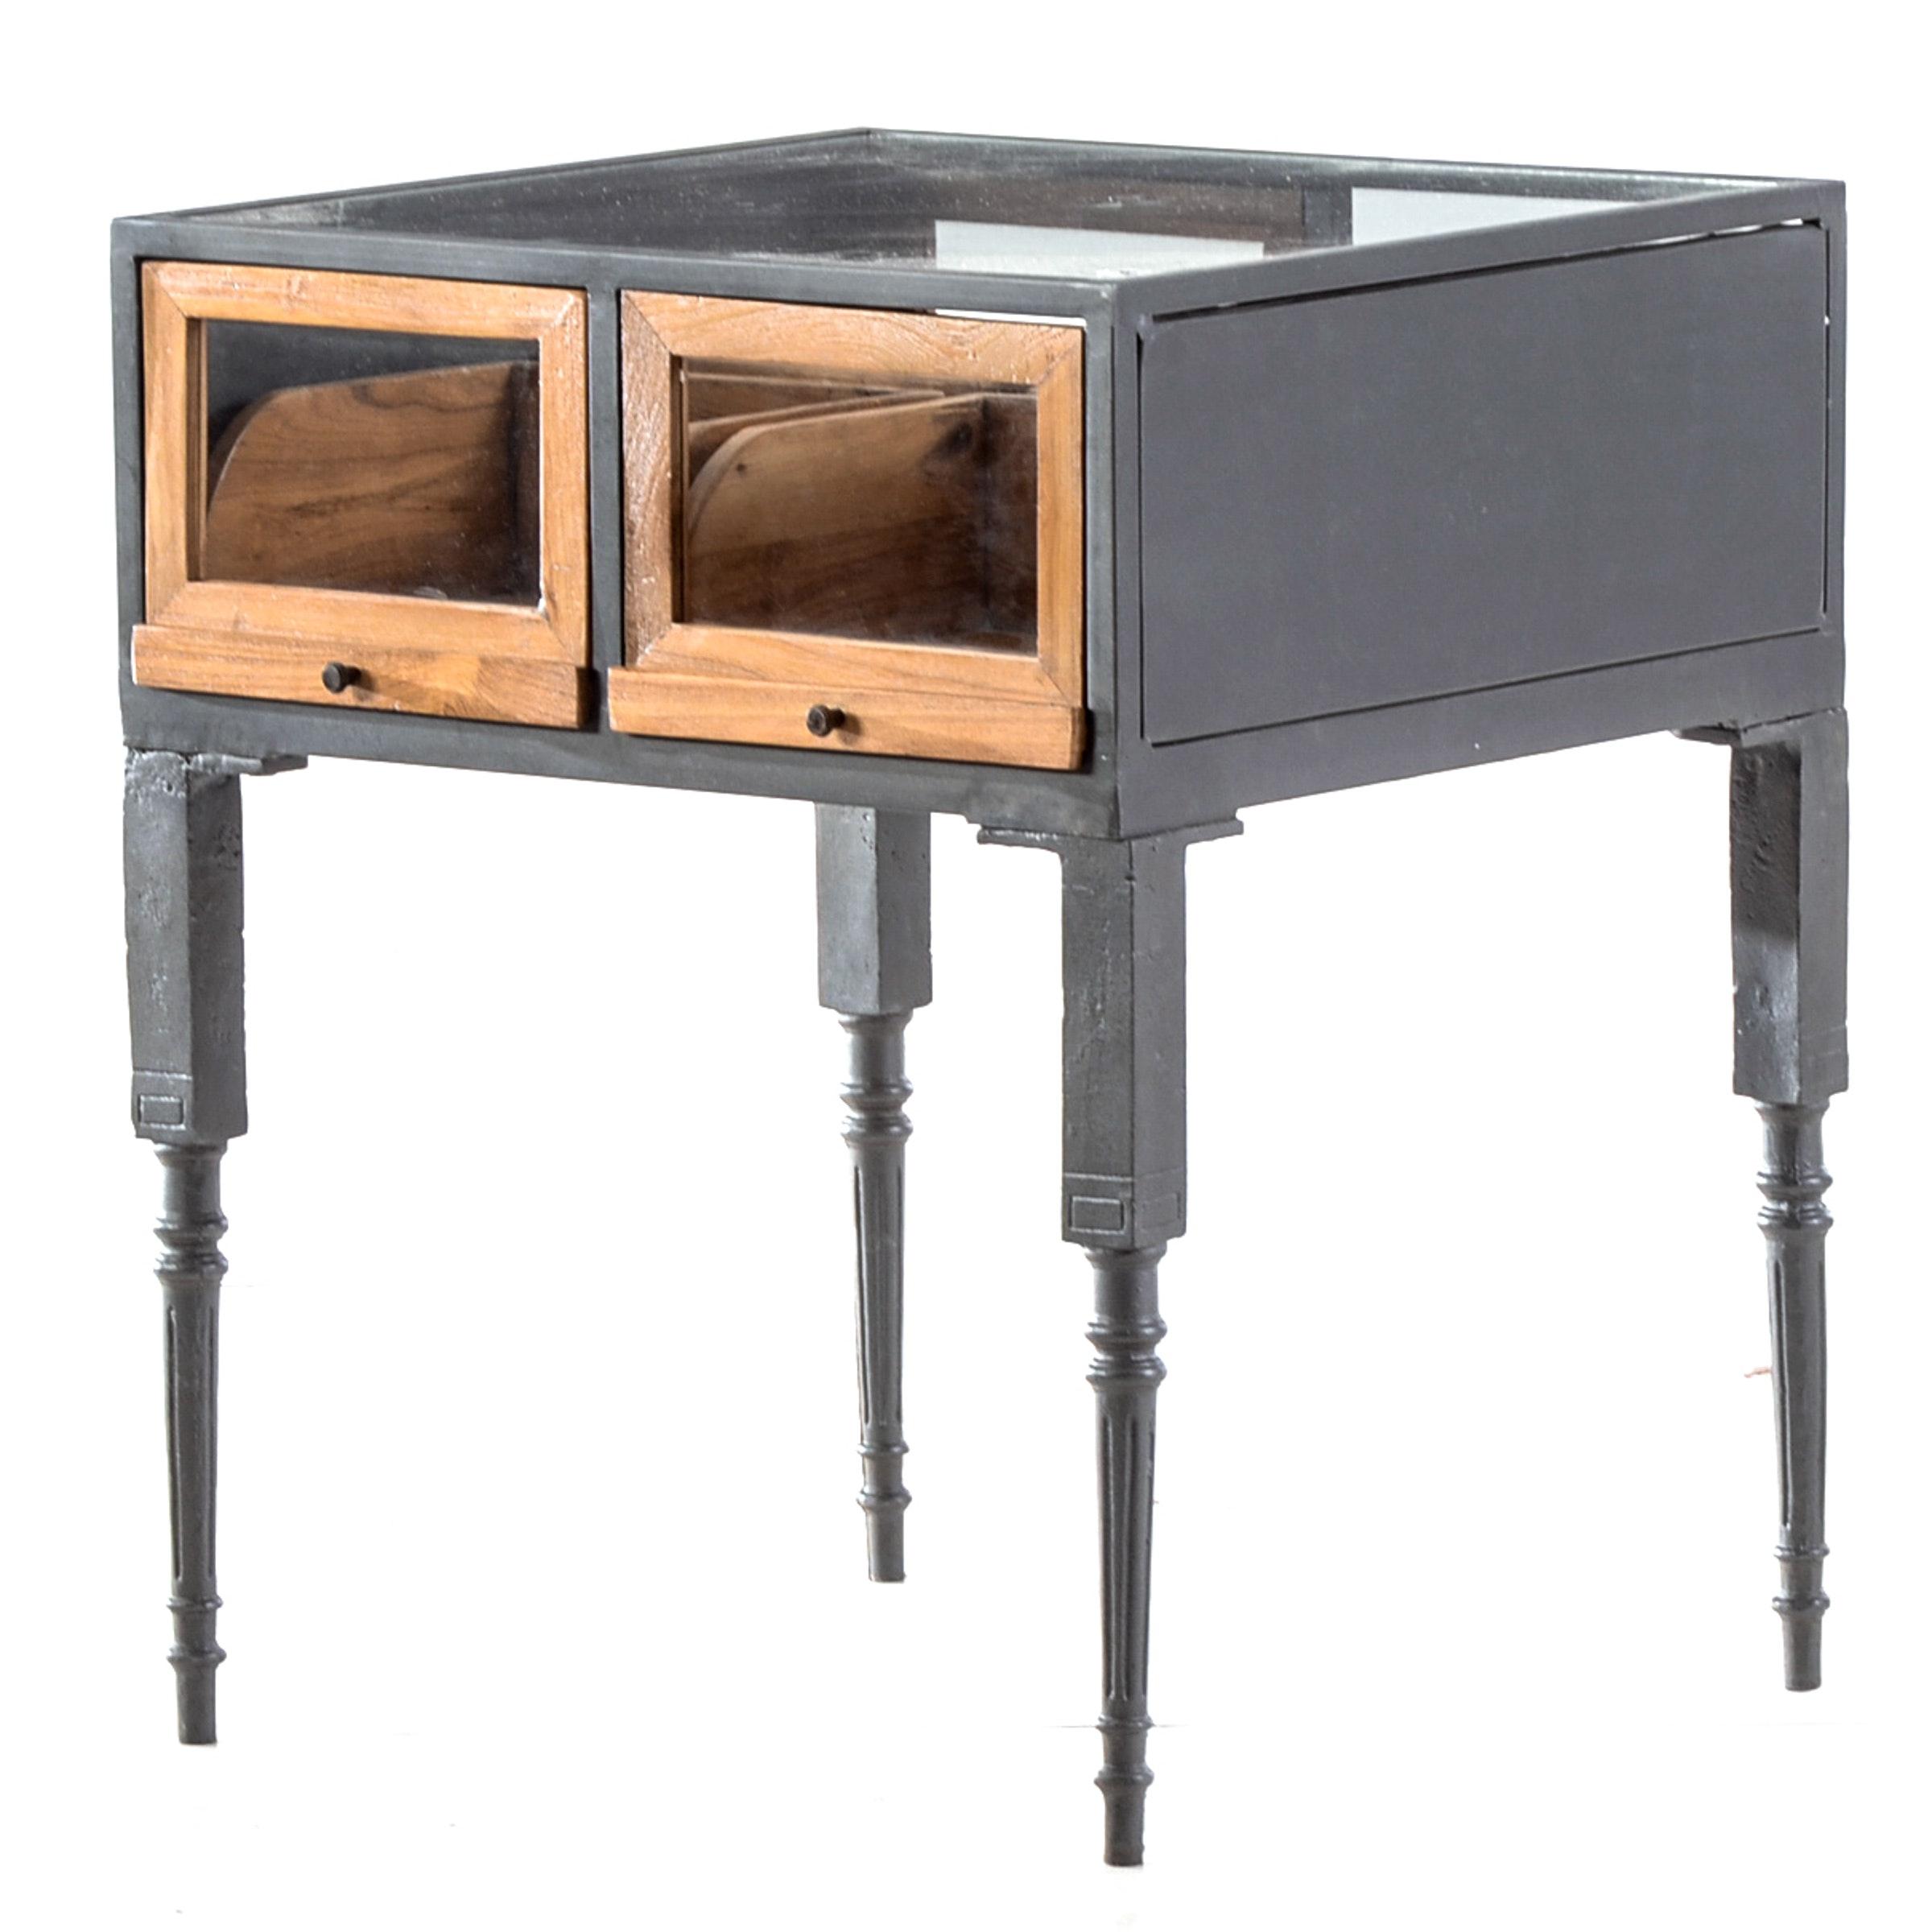 Sliding Wood and Glass Drawer Display Table